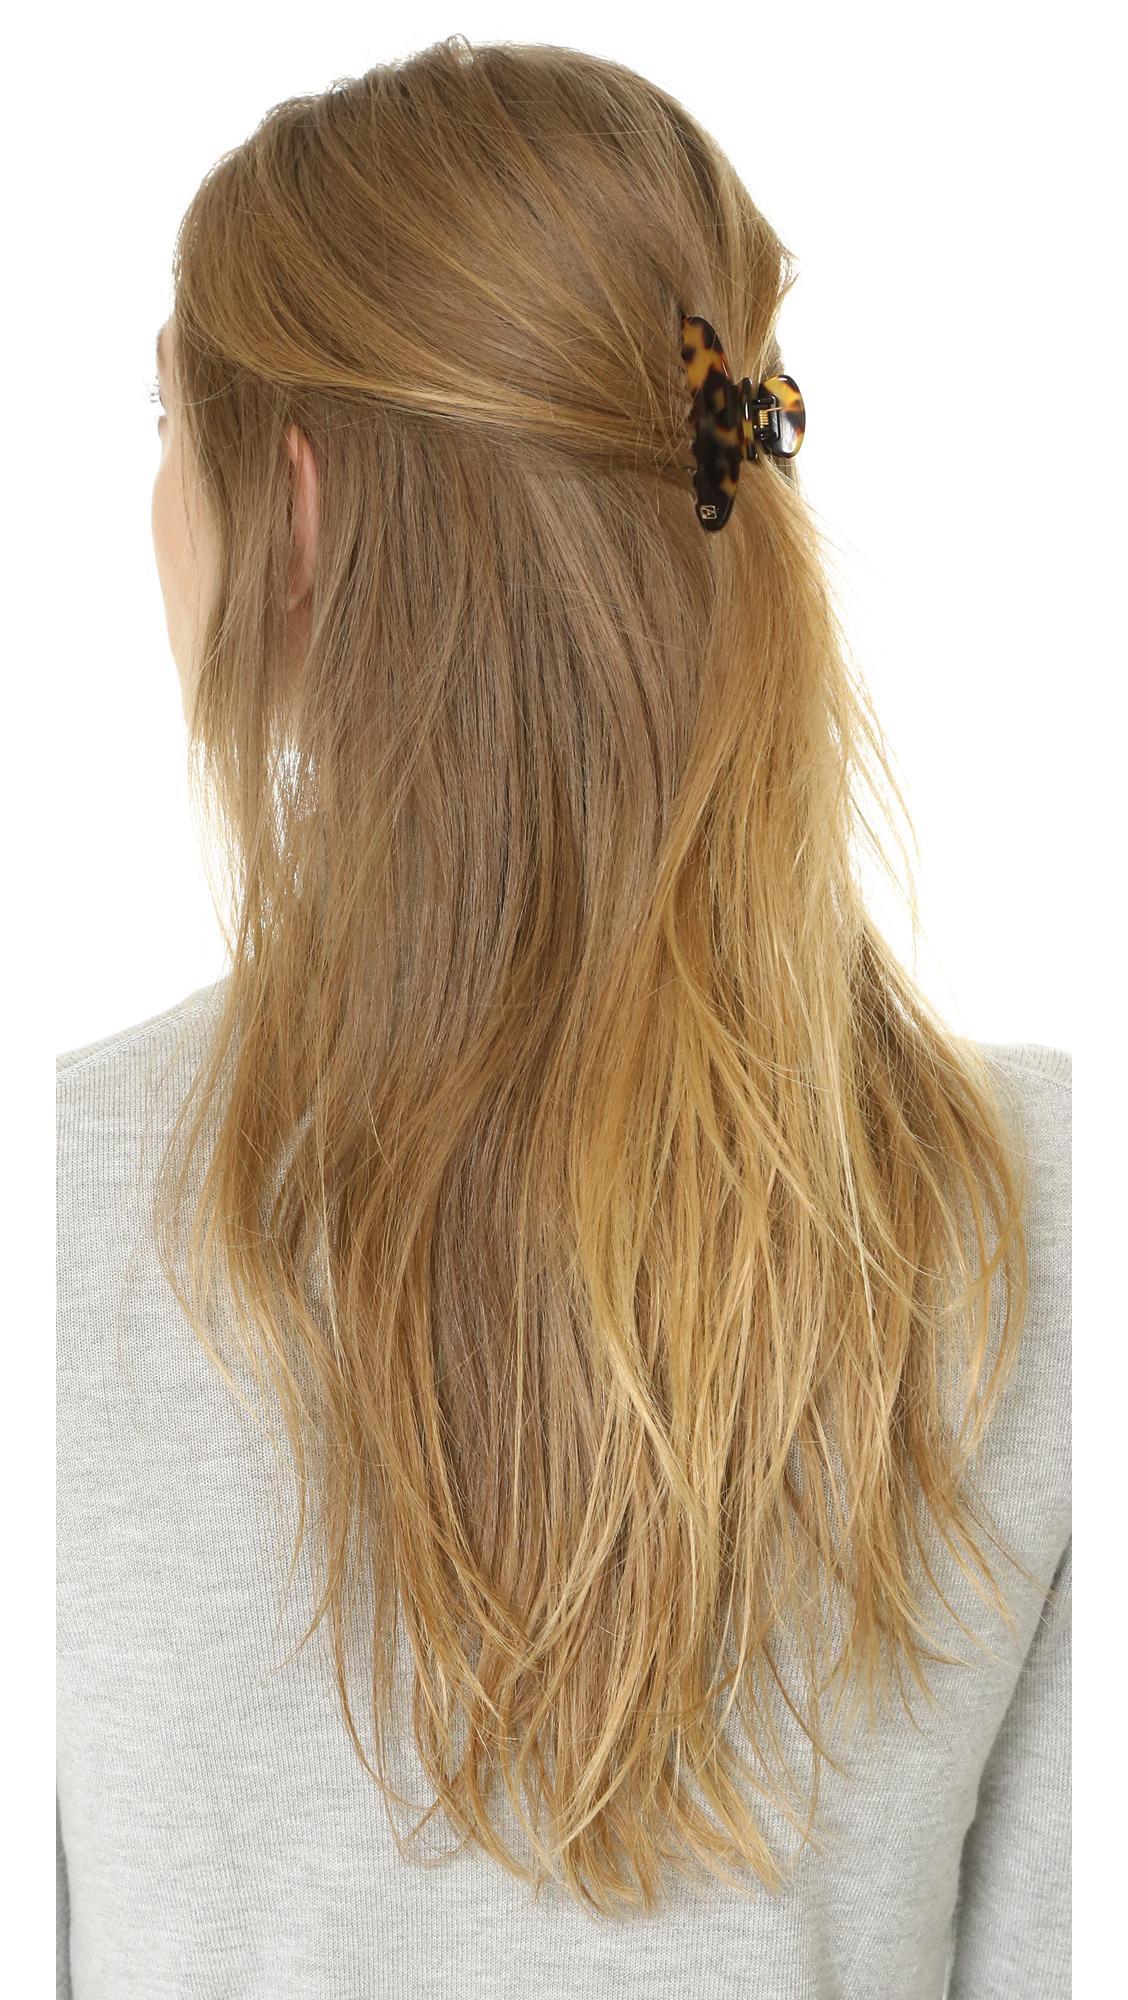 alexandre de paris jaw hair clip in brown lyst